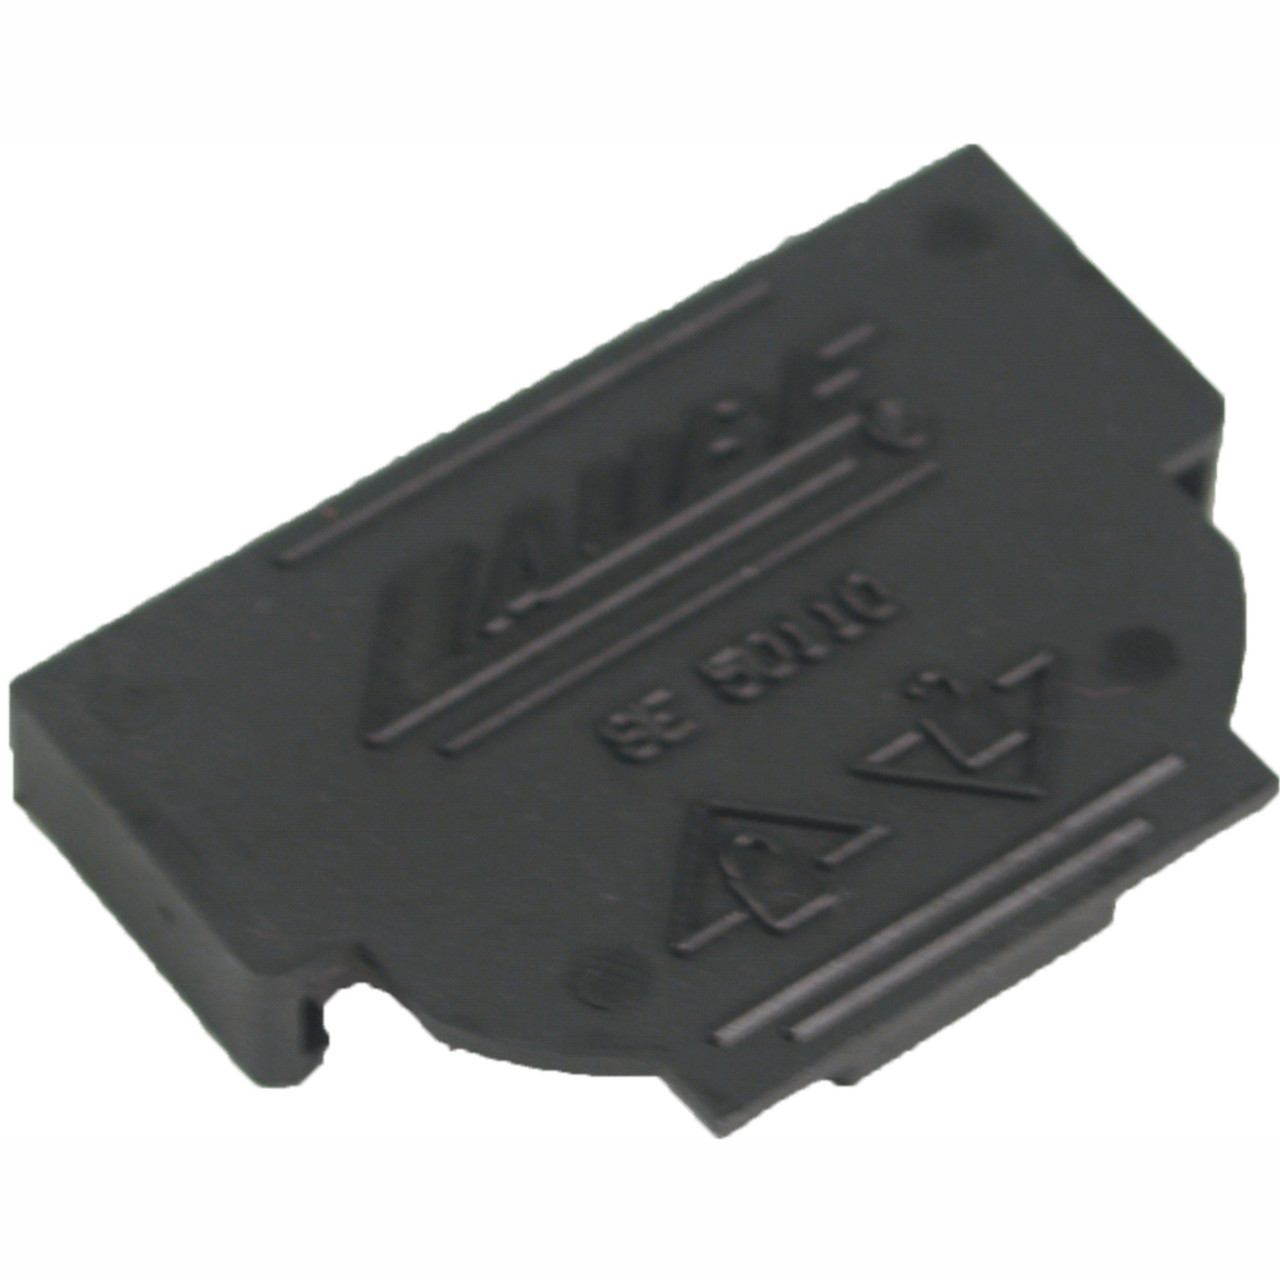 Purrrl/Speed Feed Comb lock shown.